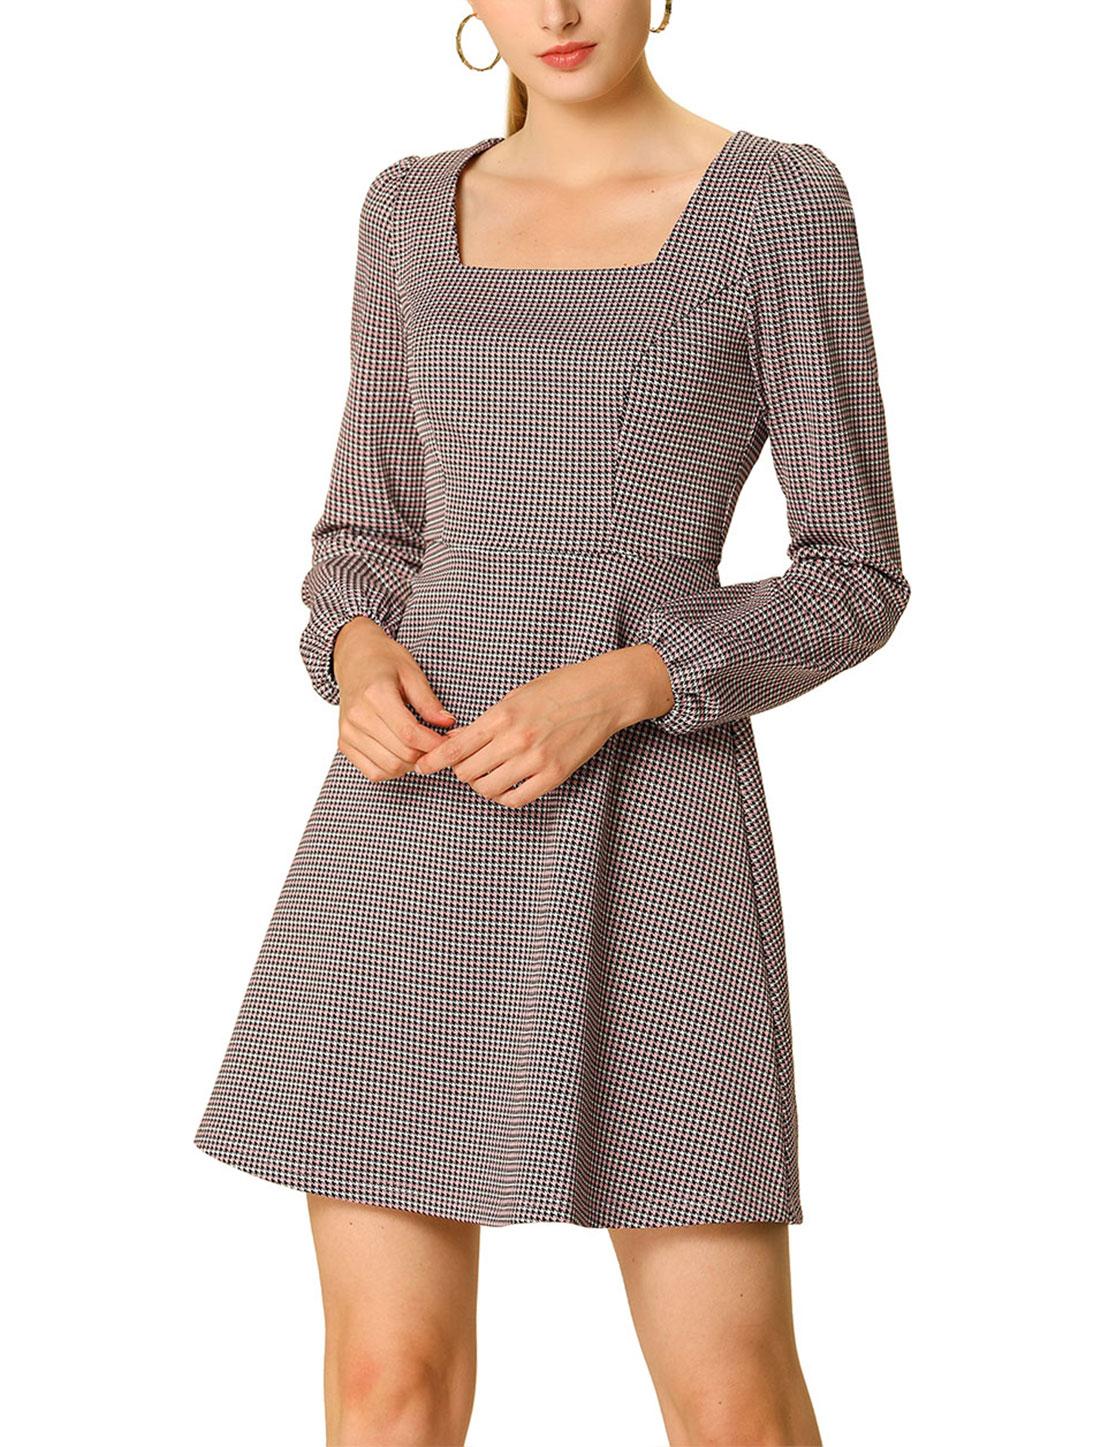 Allegra K Women's Fall Square Neck Vintage Mini Plaid Dress Pink XS (US 2)